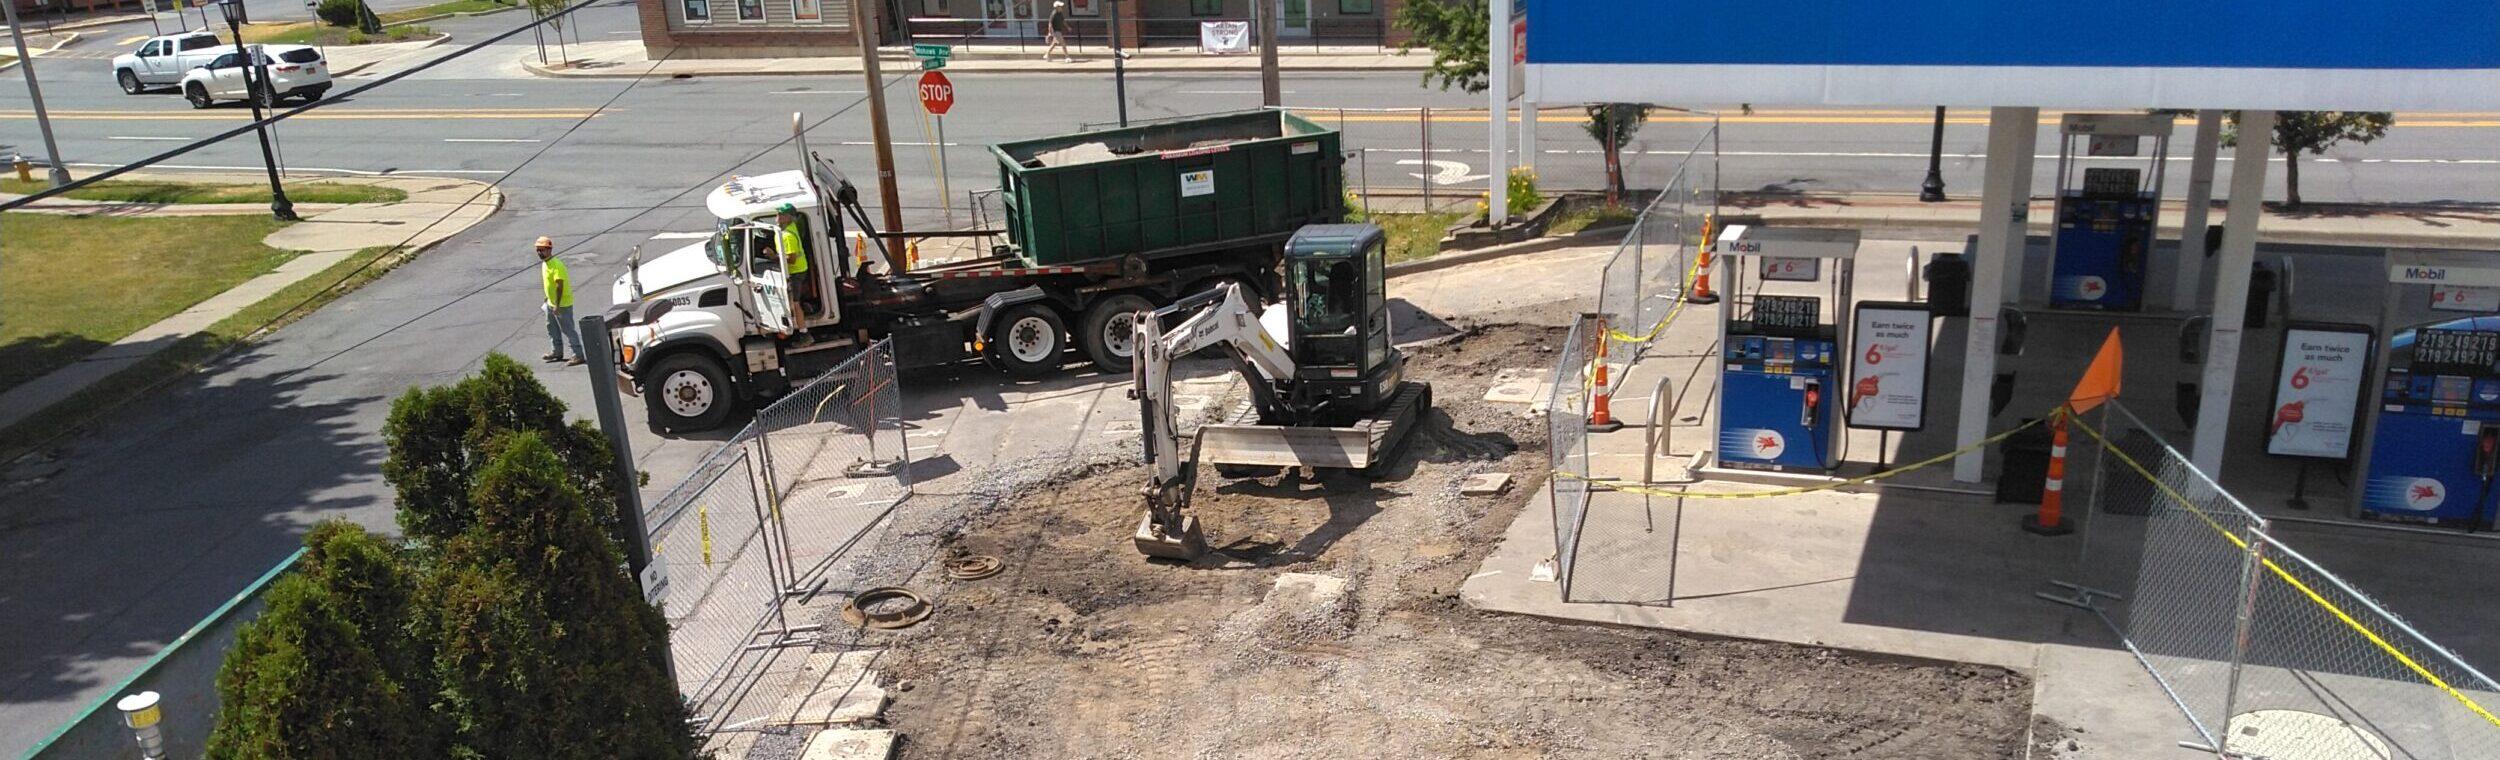 Sve Installation At Fuel Service Station Eastern New York 2